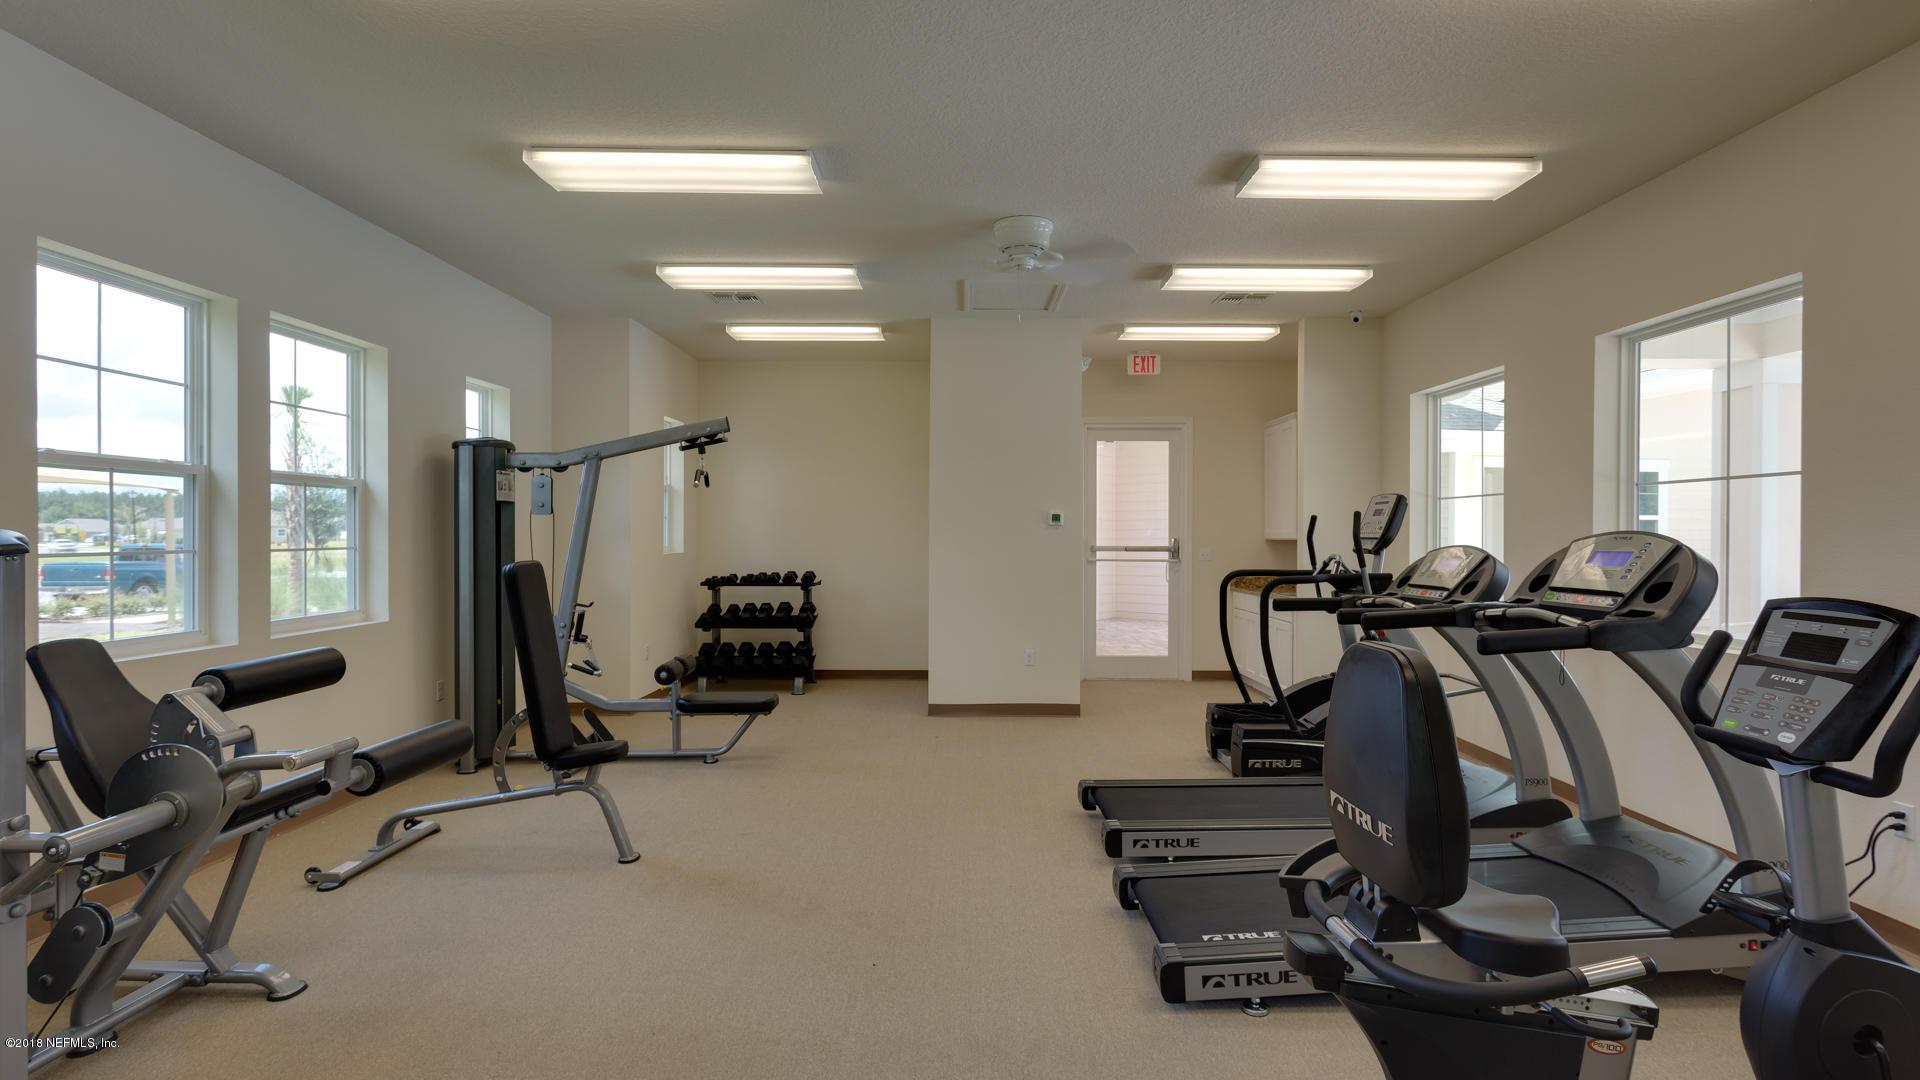 694 NORTHSIDE, JACKSONVILLE, FLORIDA 32218, 4 Bedrooms Bedrooms, ,3 BathroomsBathrooms,Residential,For sale,NORTHSIDE,1059863